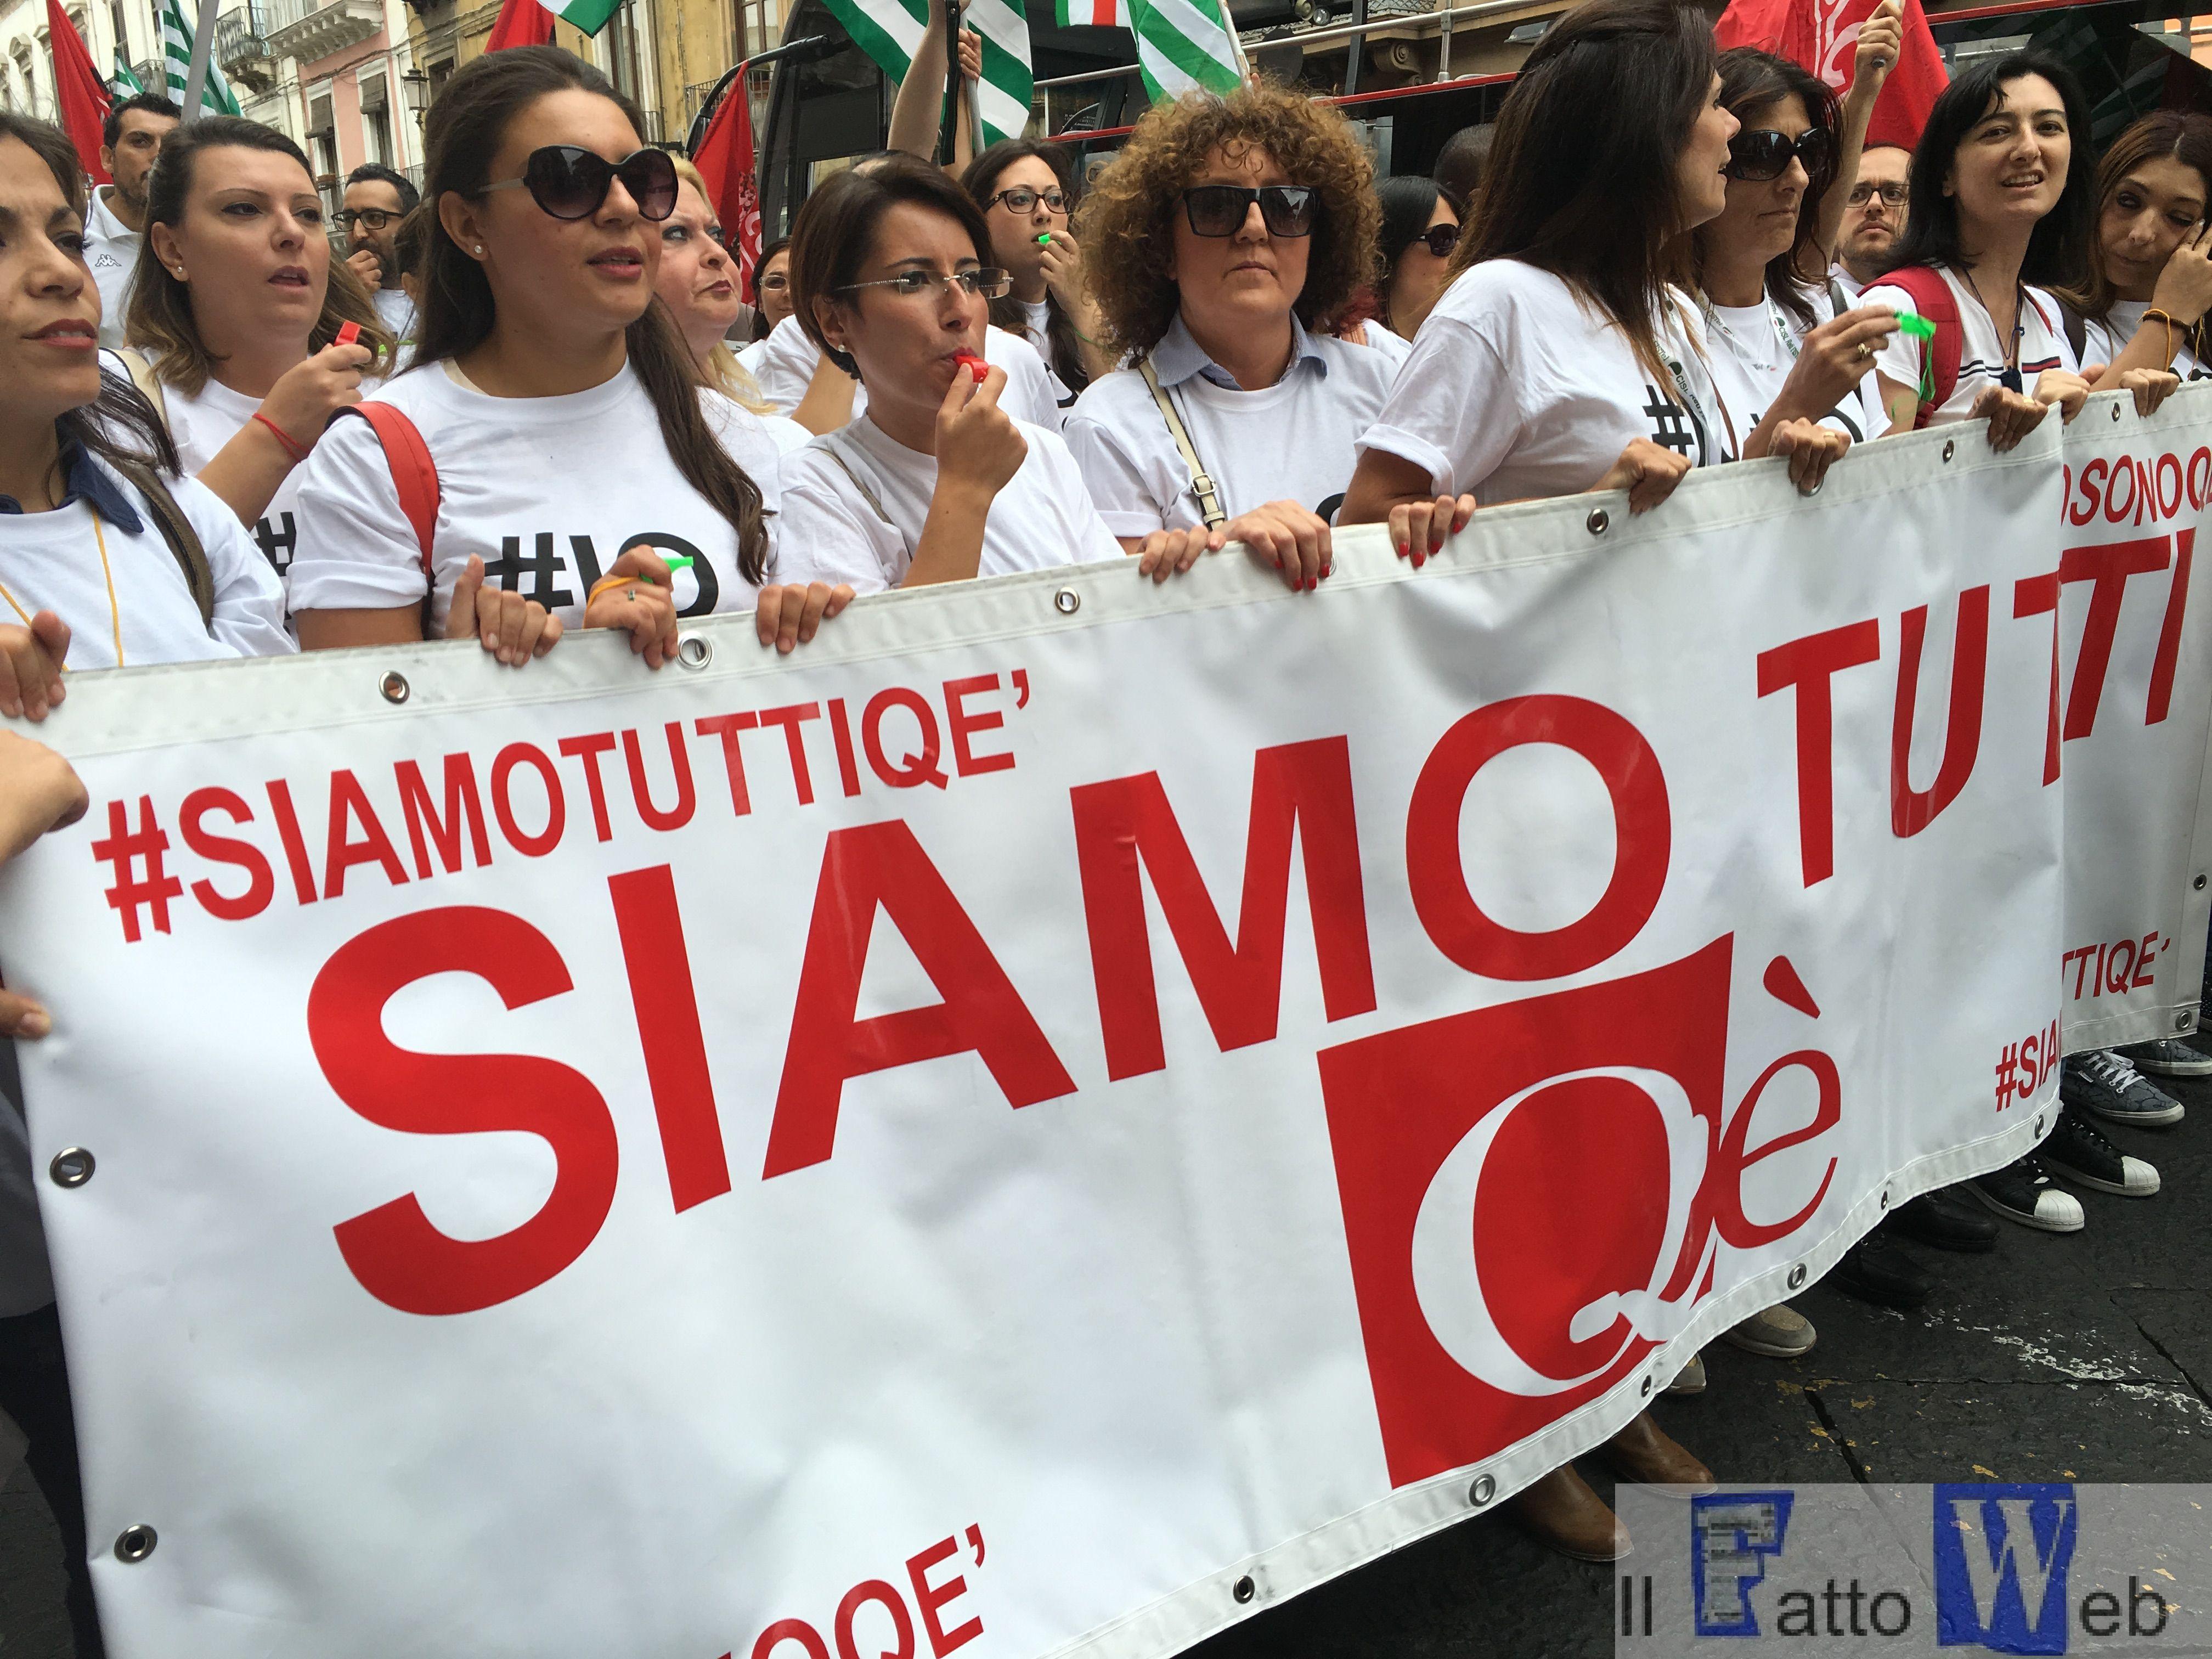 Vertenza Call center Qè di Paternò, oggi manifestazione a Catania per dire no al licenziamento di 600 operatori